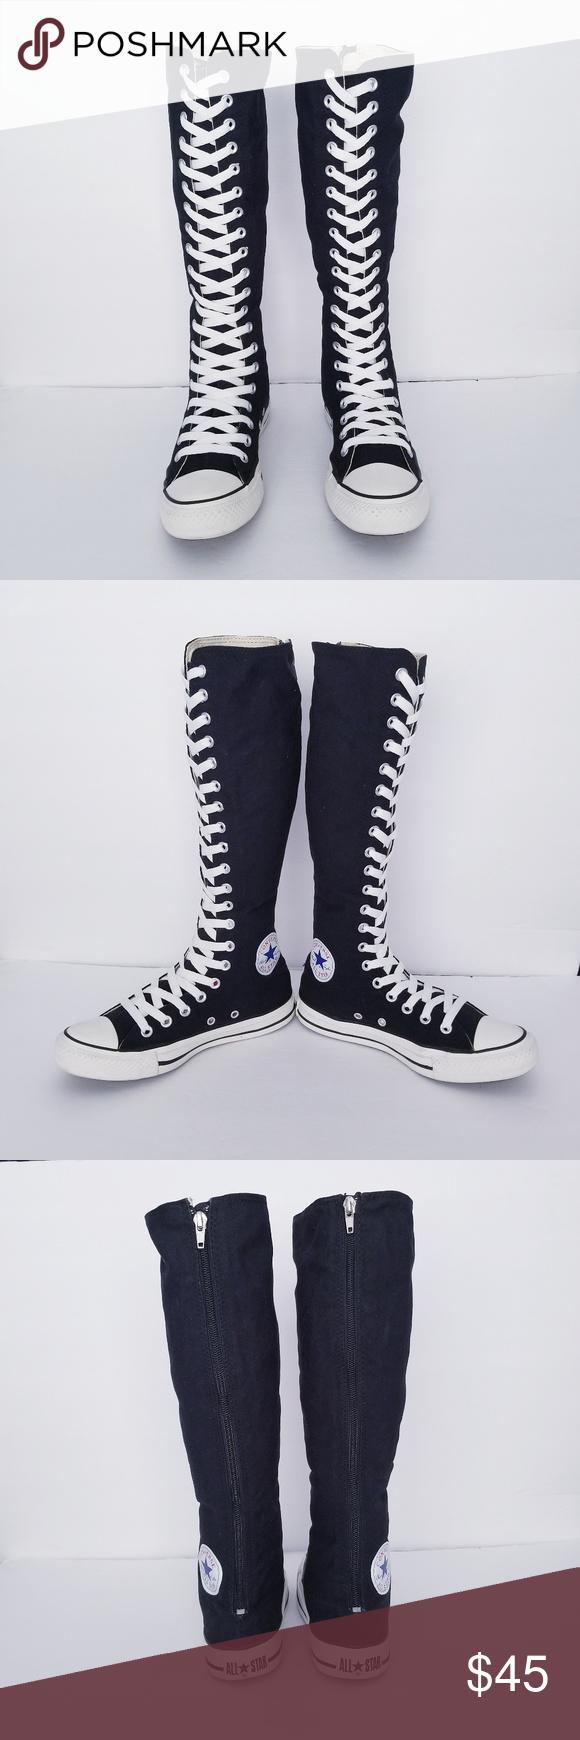 Converse Mid Calf/ Knee High Tops